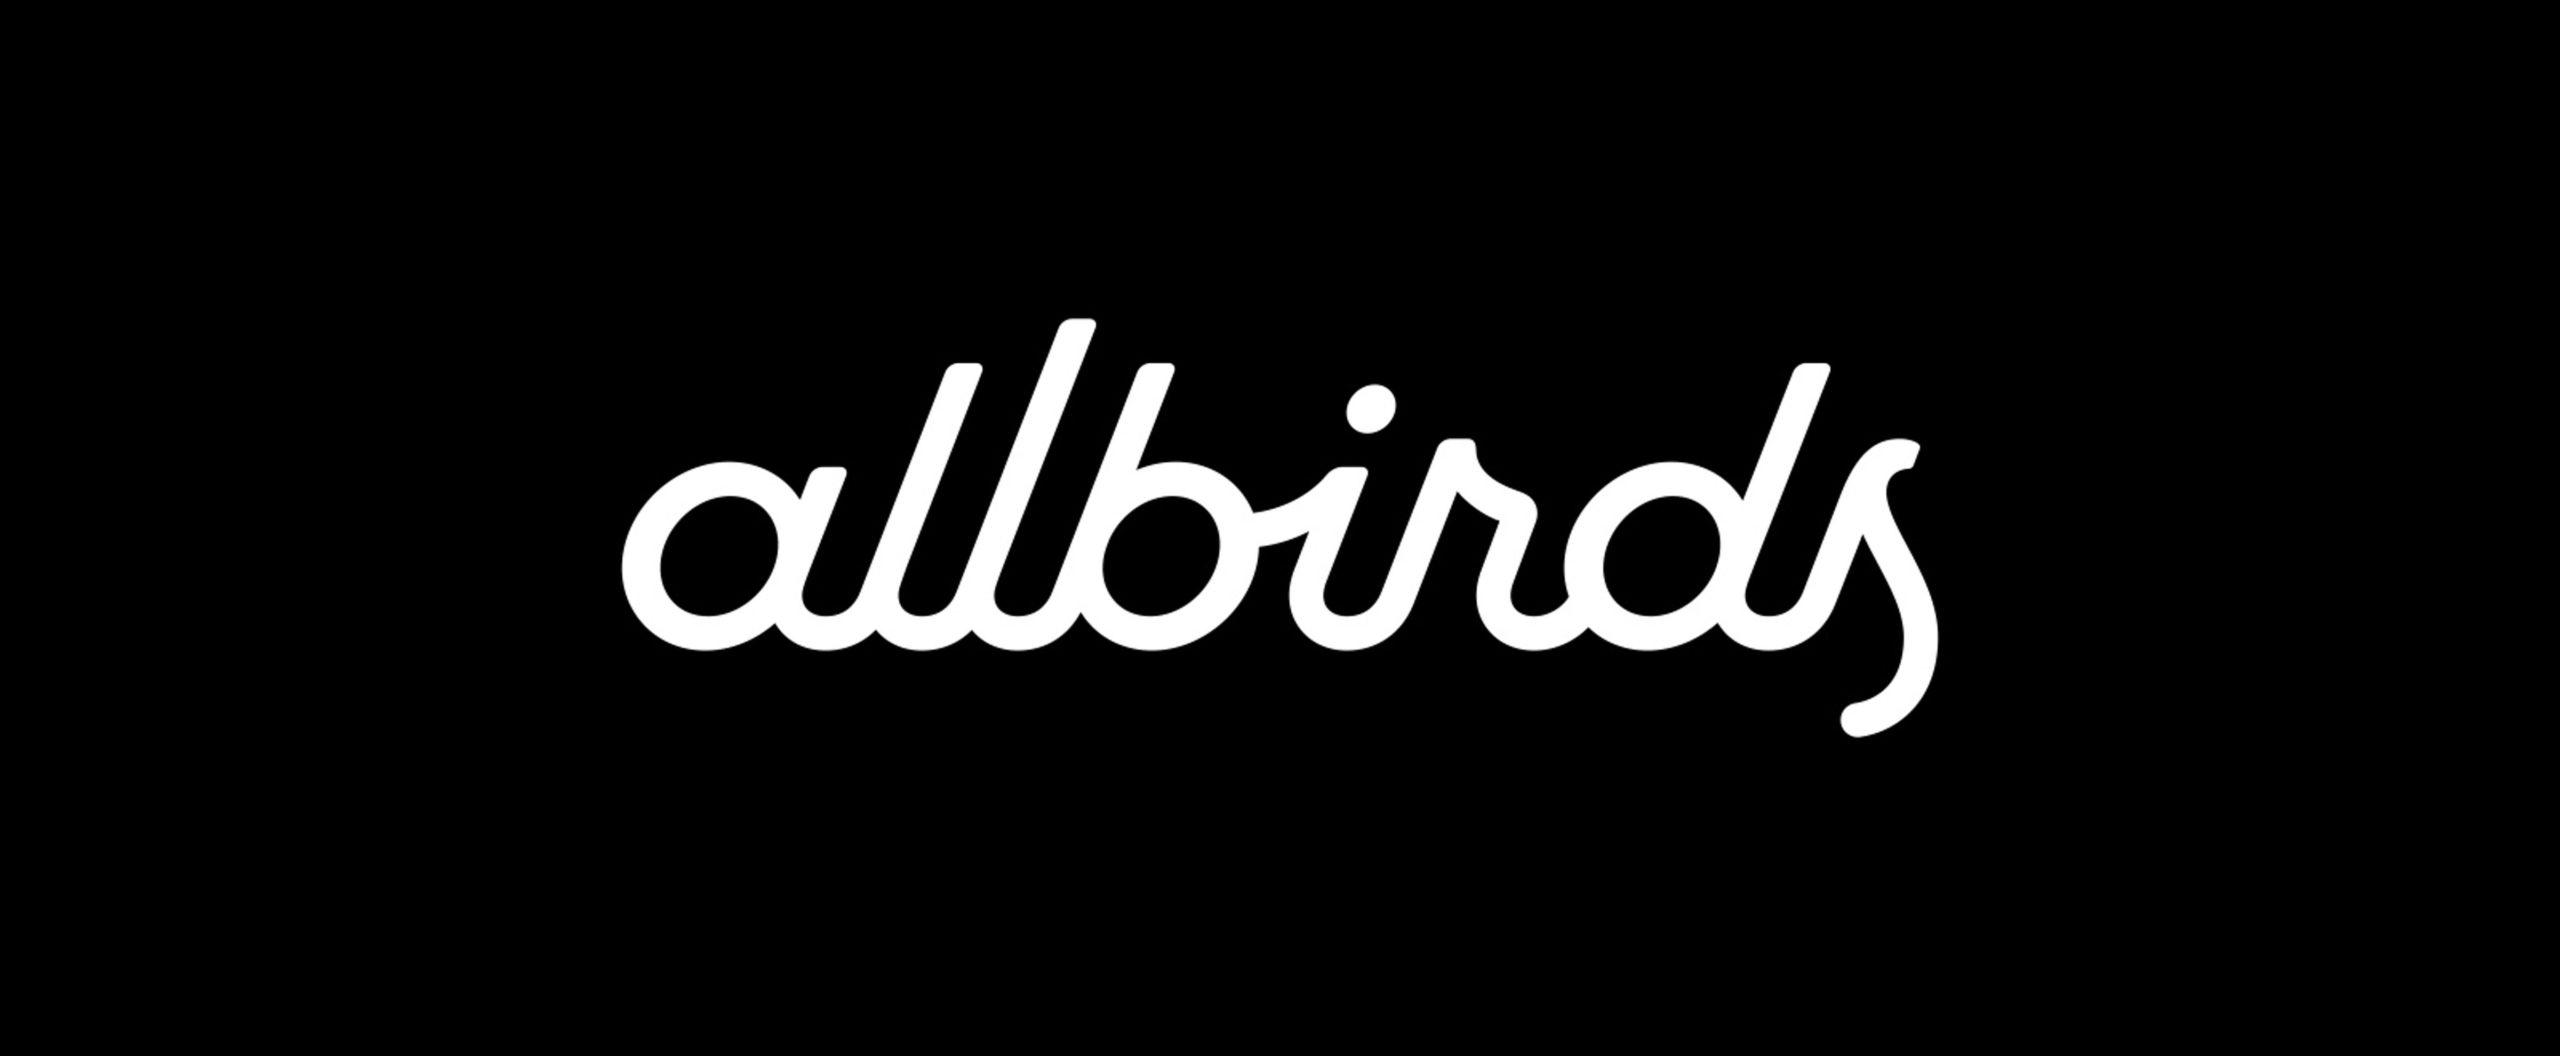 New-Zealand-American footwear company Allbirds' logo